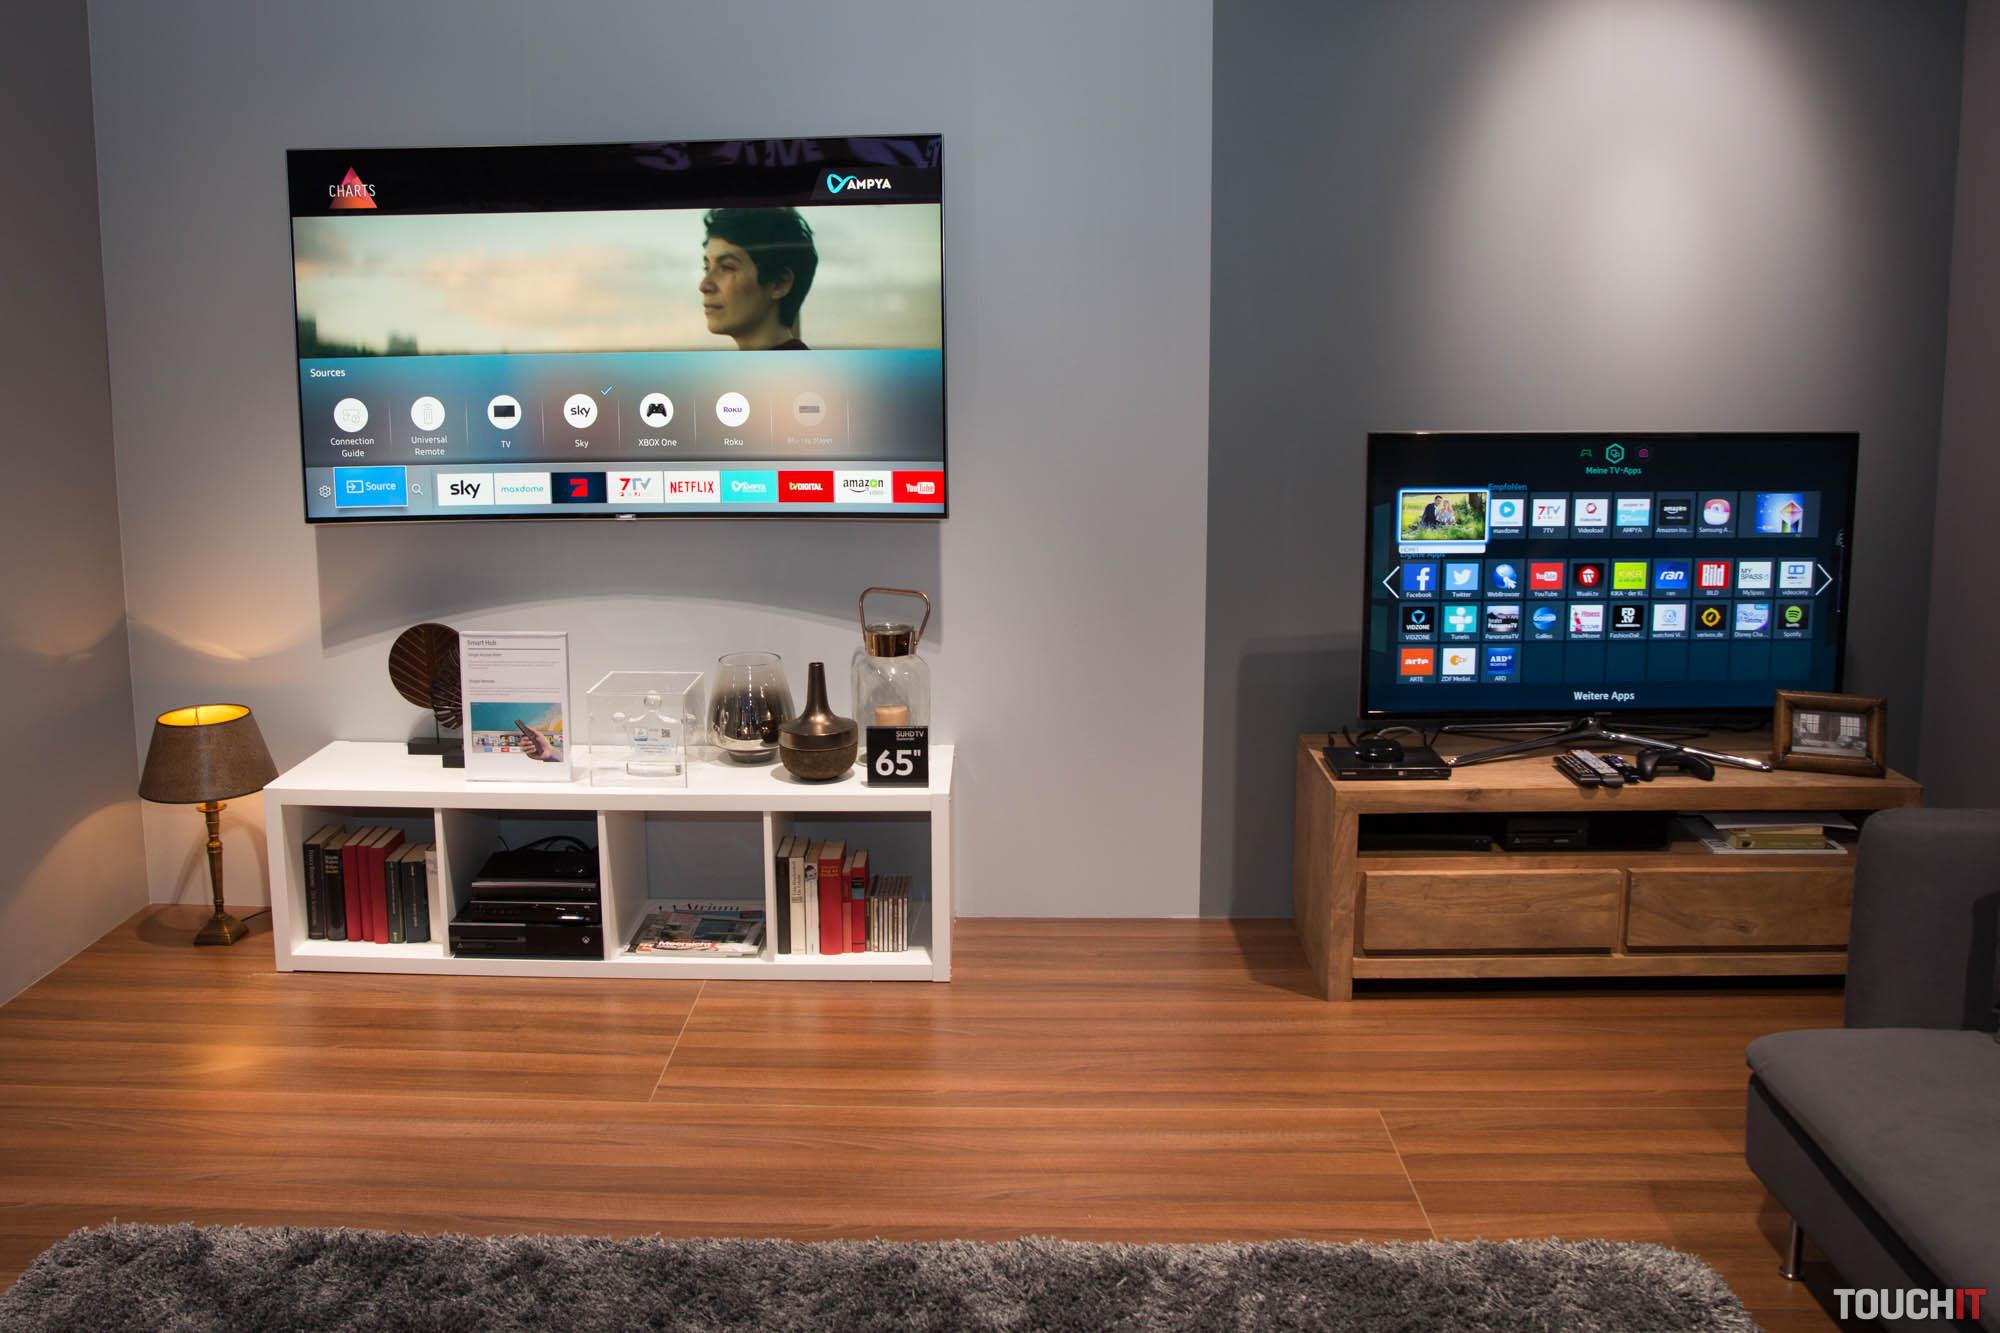 5e64216e9 VIDEO TOUCHIT: Samsung prezentoval až 10 ročnú záruku na televízory ...